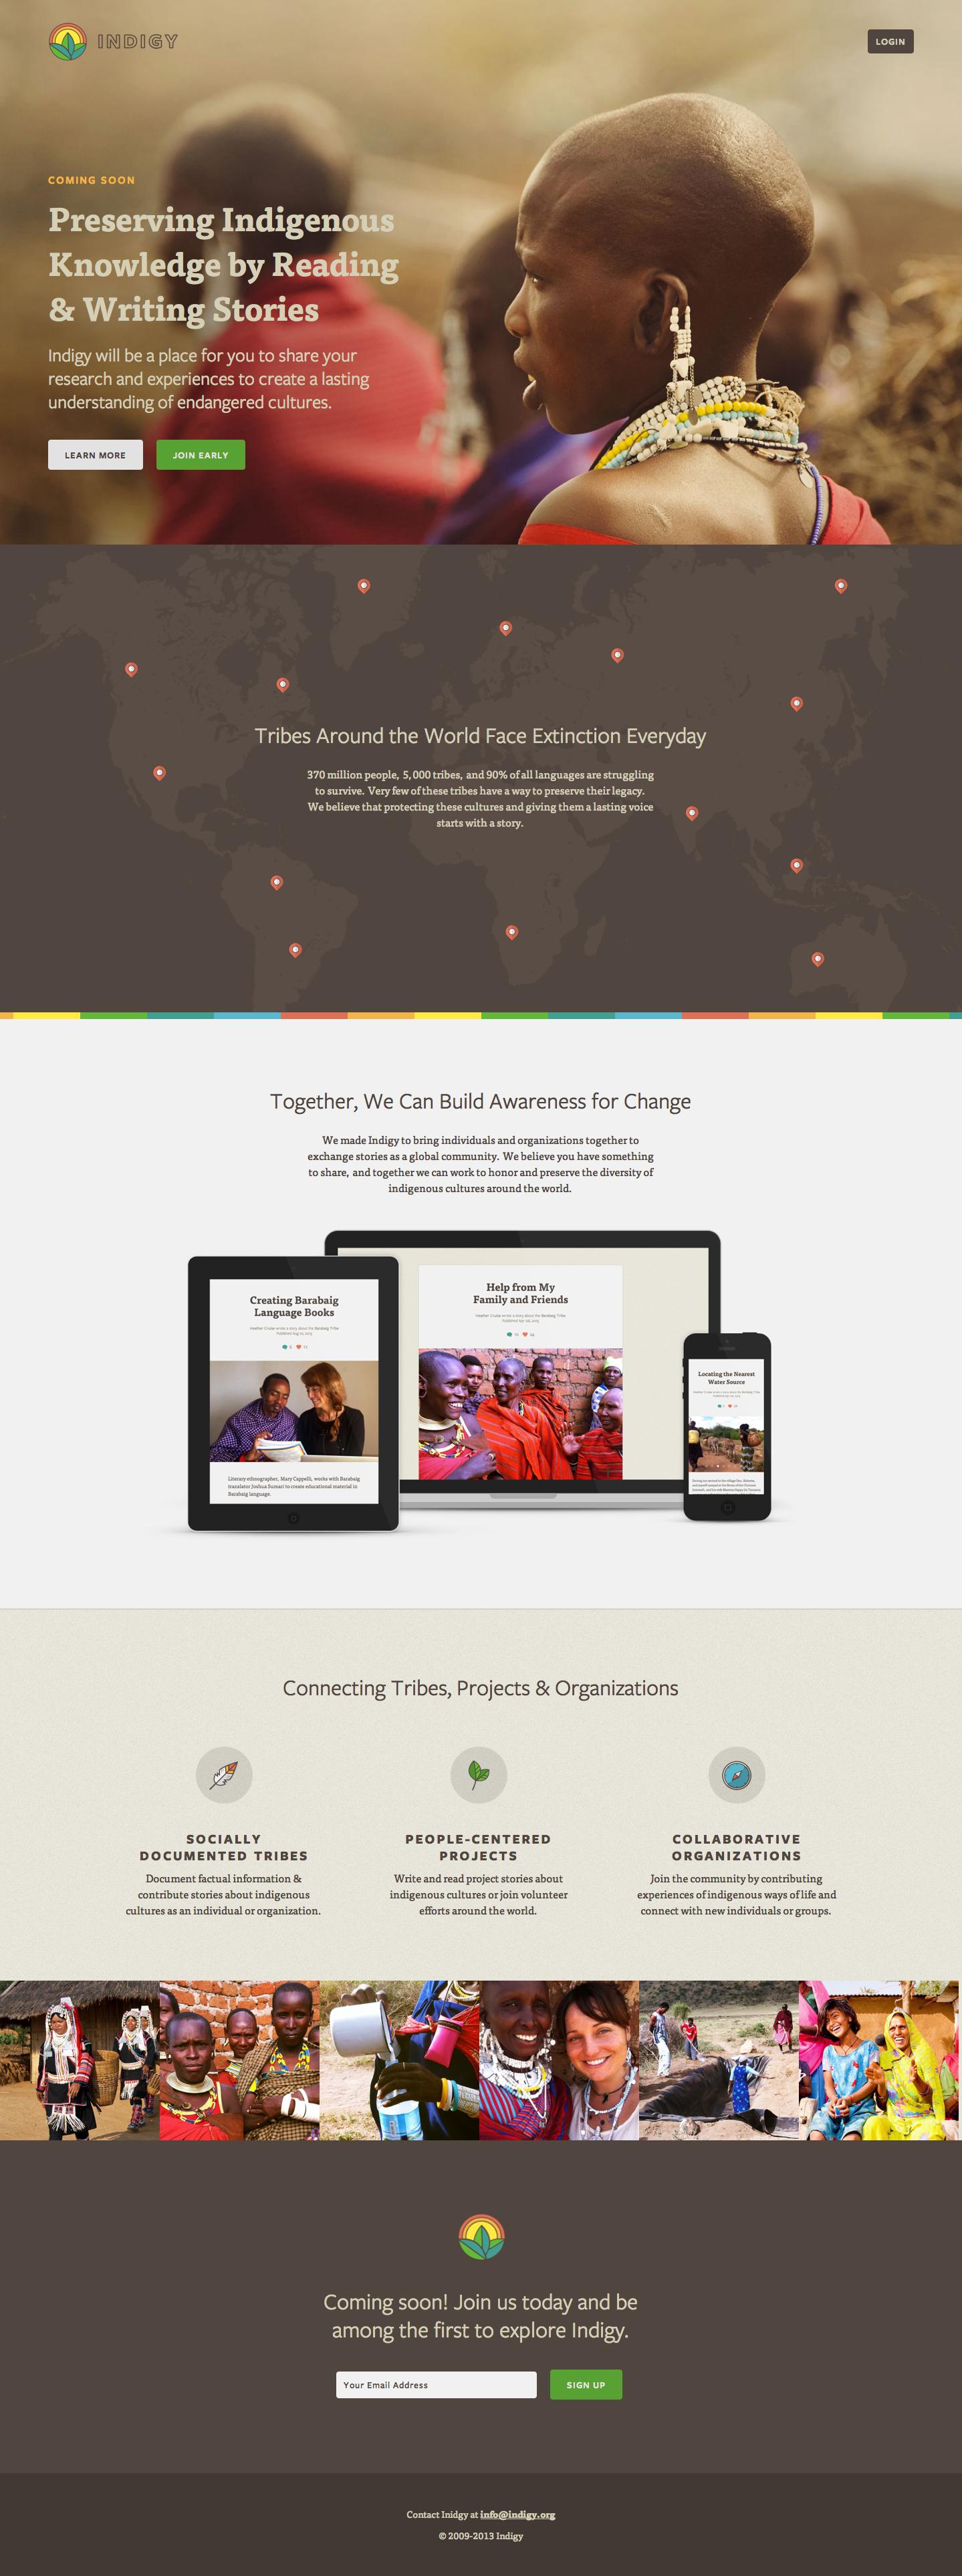 Unique Web Designc Indigy Webdesign Design Http Www Pinterest Com Aldenchong Web Design Web Design Examples Mobile Web Design